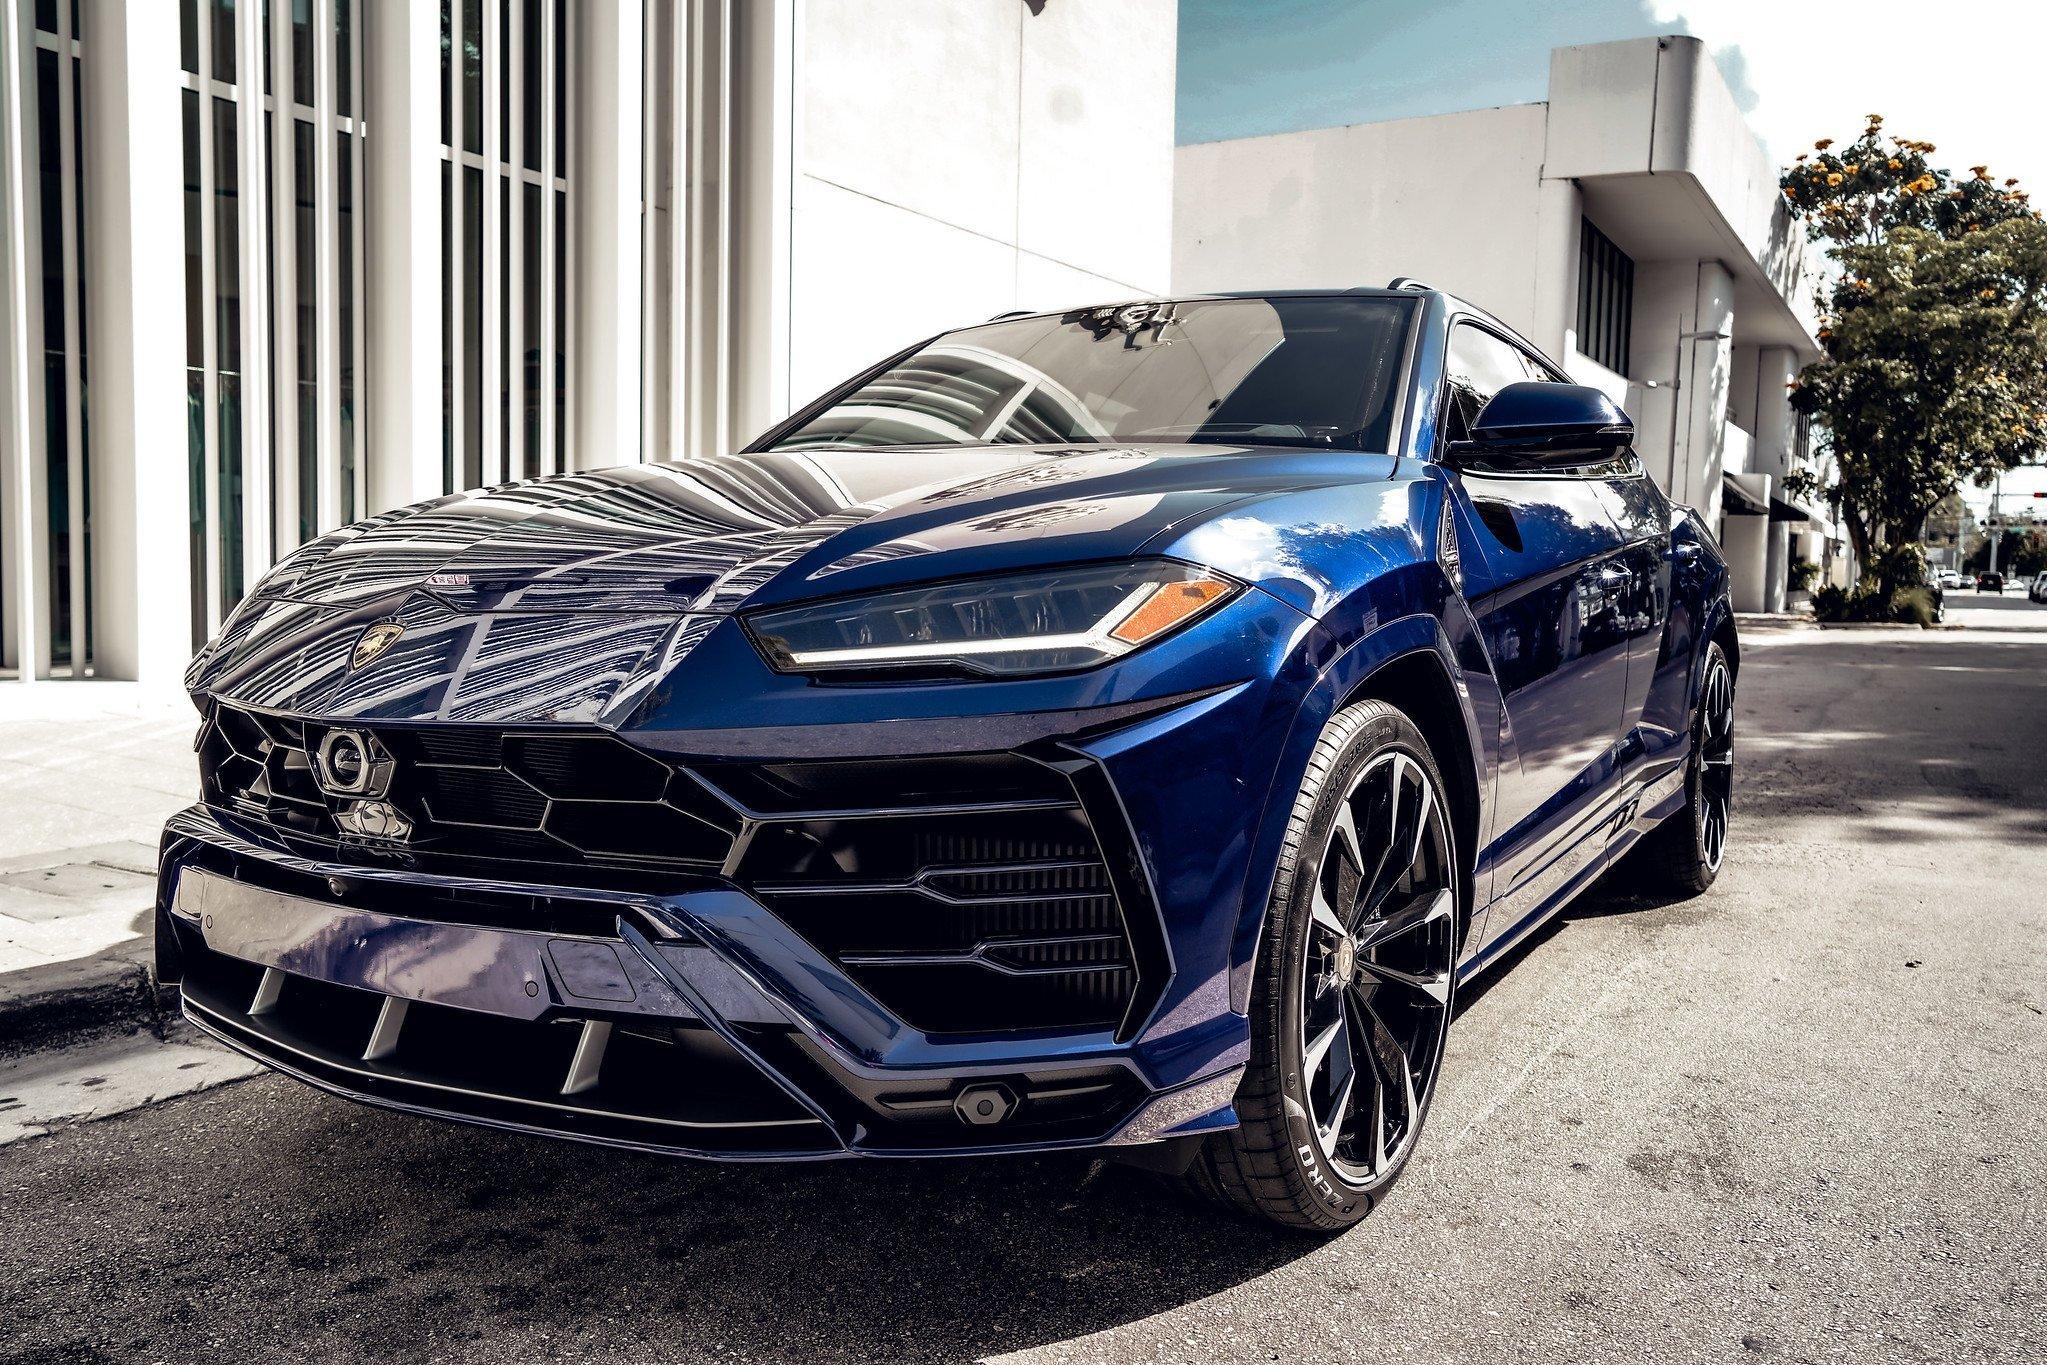 Image #2 of our  2021 Lamborghini Urus - Dark Blue    In Miami Fort Lauderdale Palm Beach South Florida